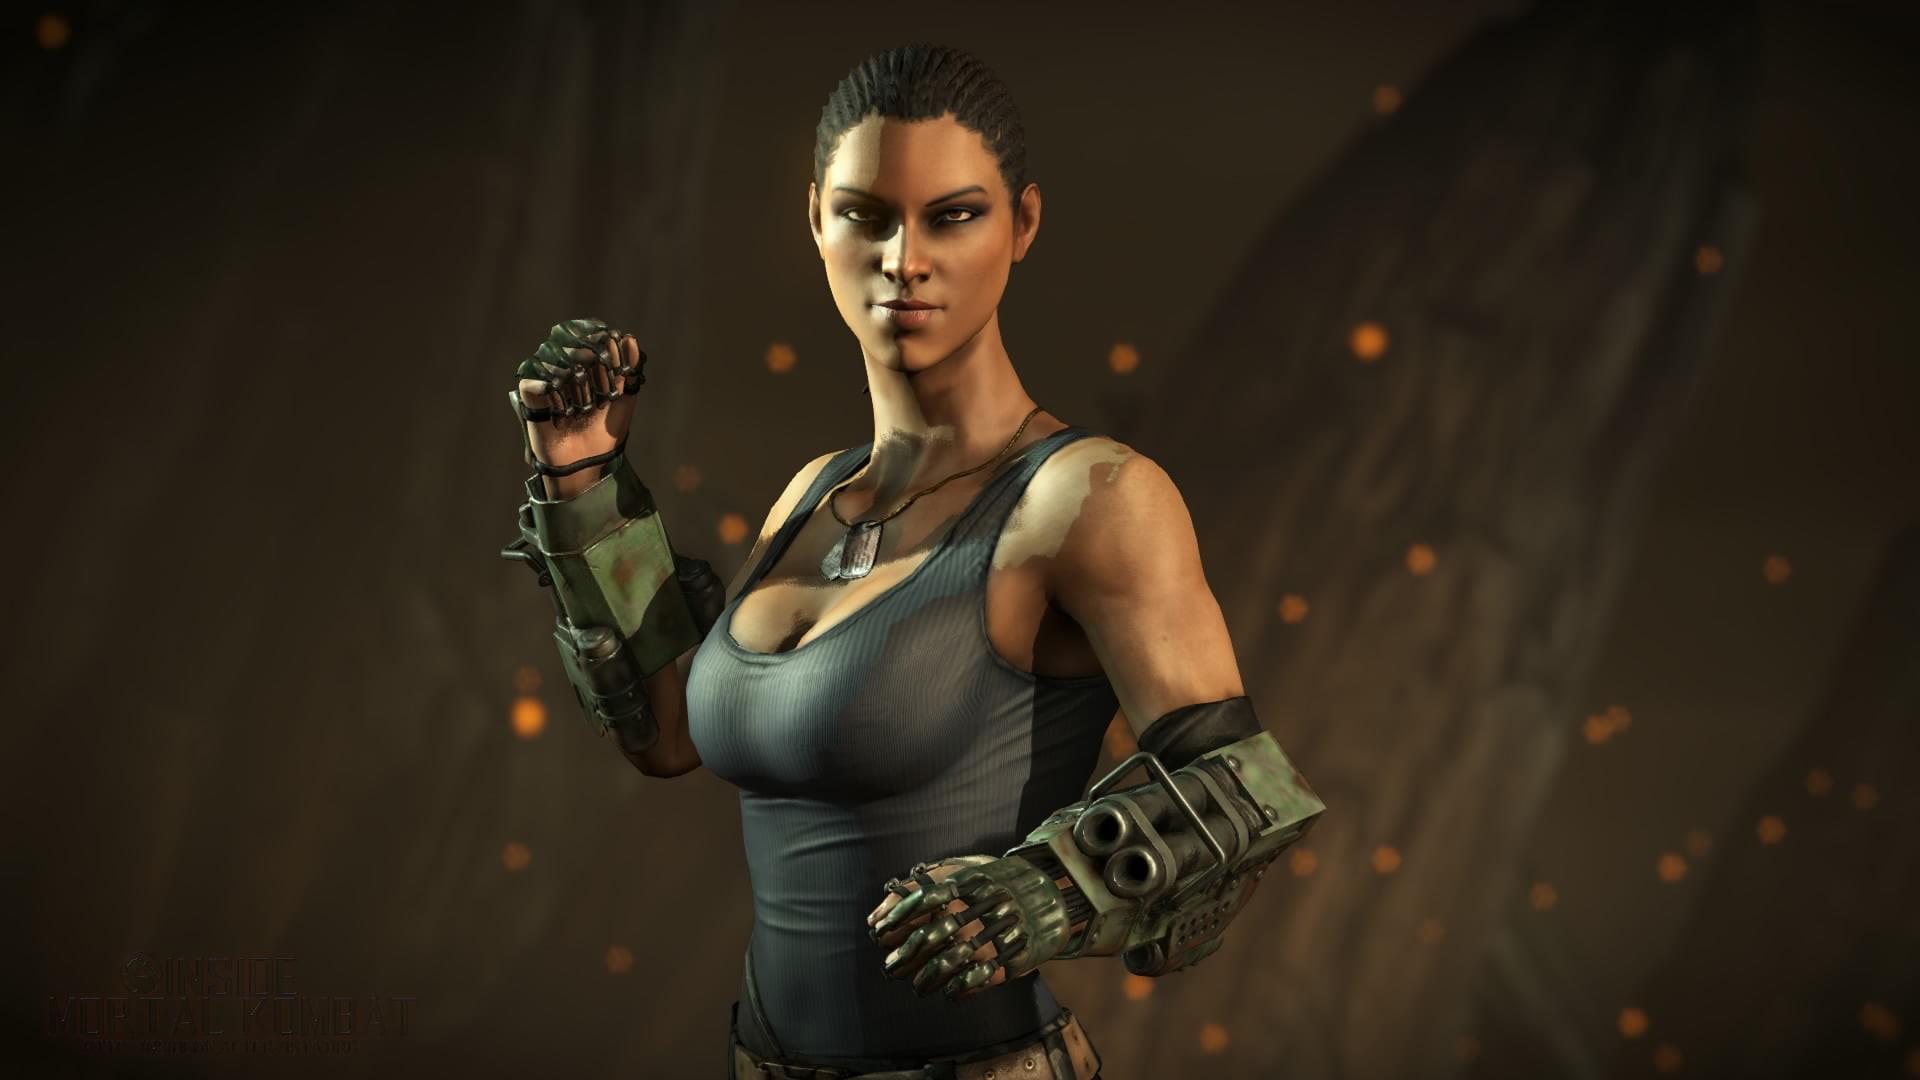 Res: 1920x1080, woman wearing black tank top with gun gauntlet illustration HD wallpaper